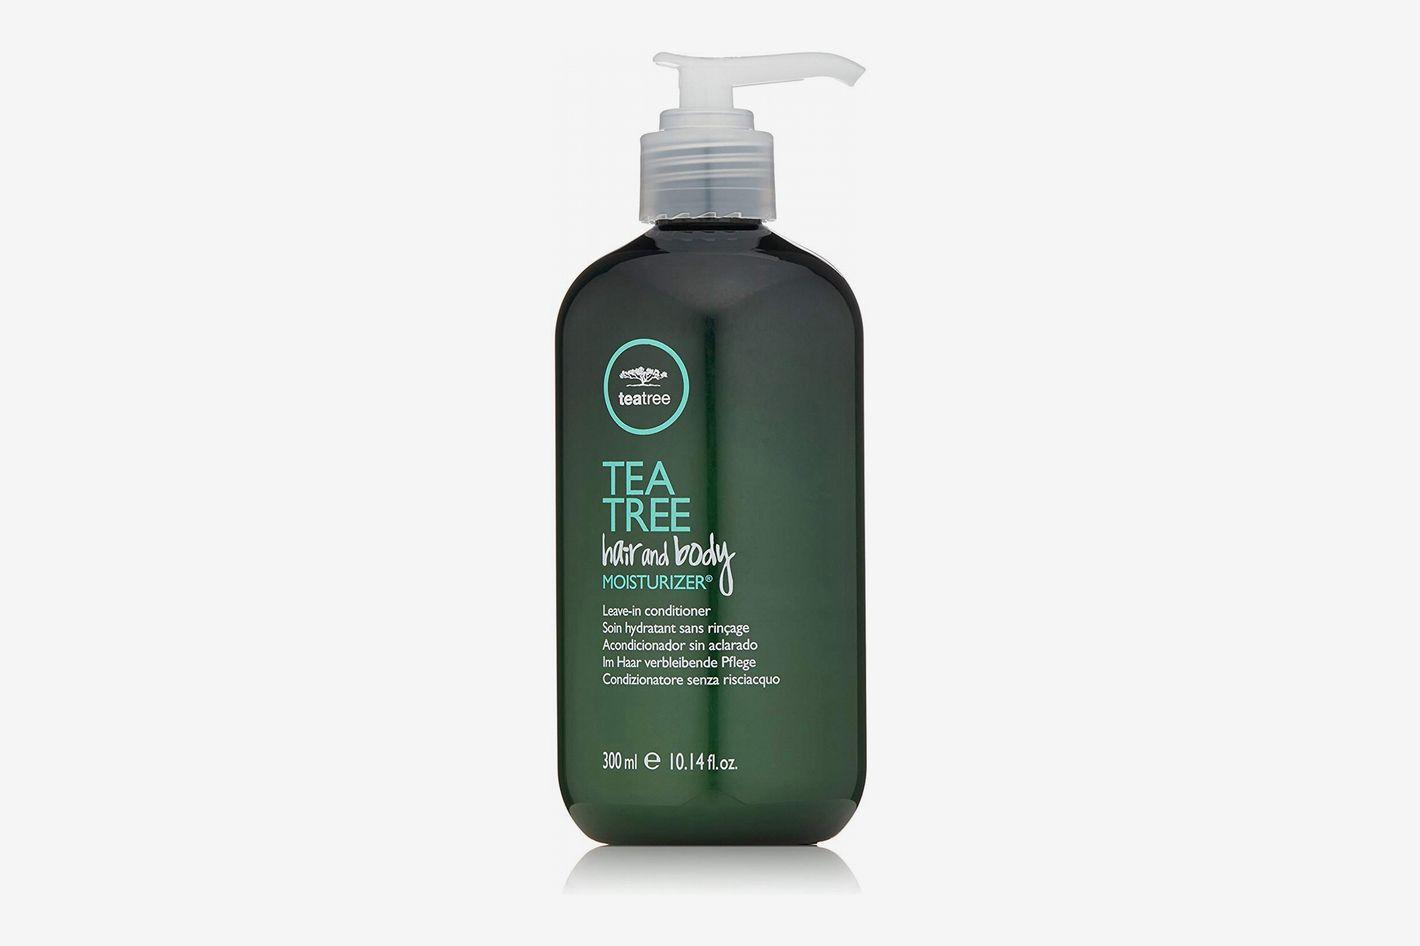 Tea Tree Hair and Body Moisturizer